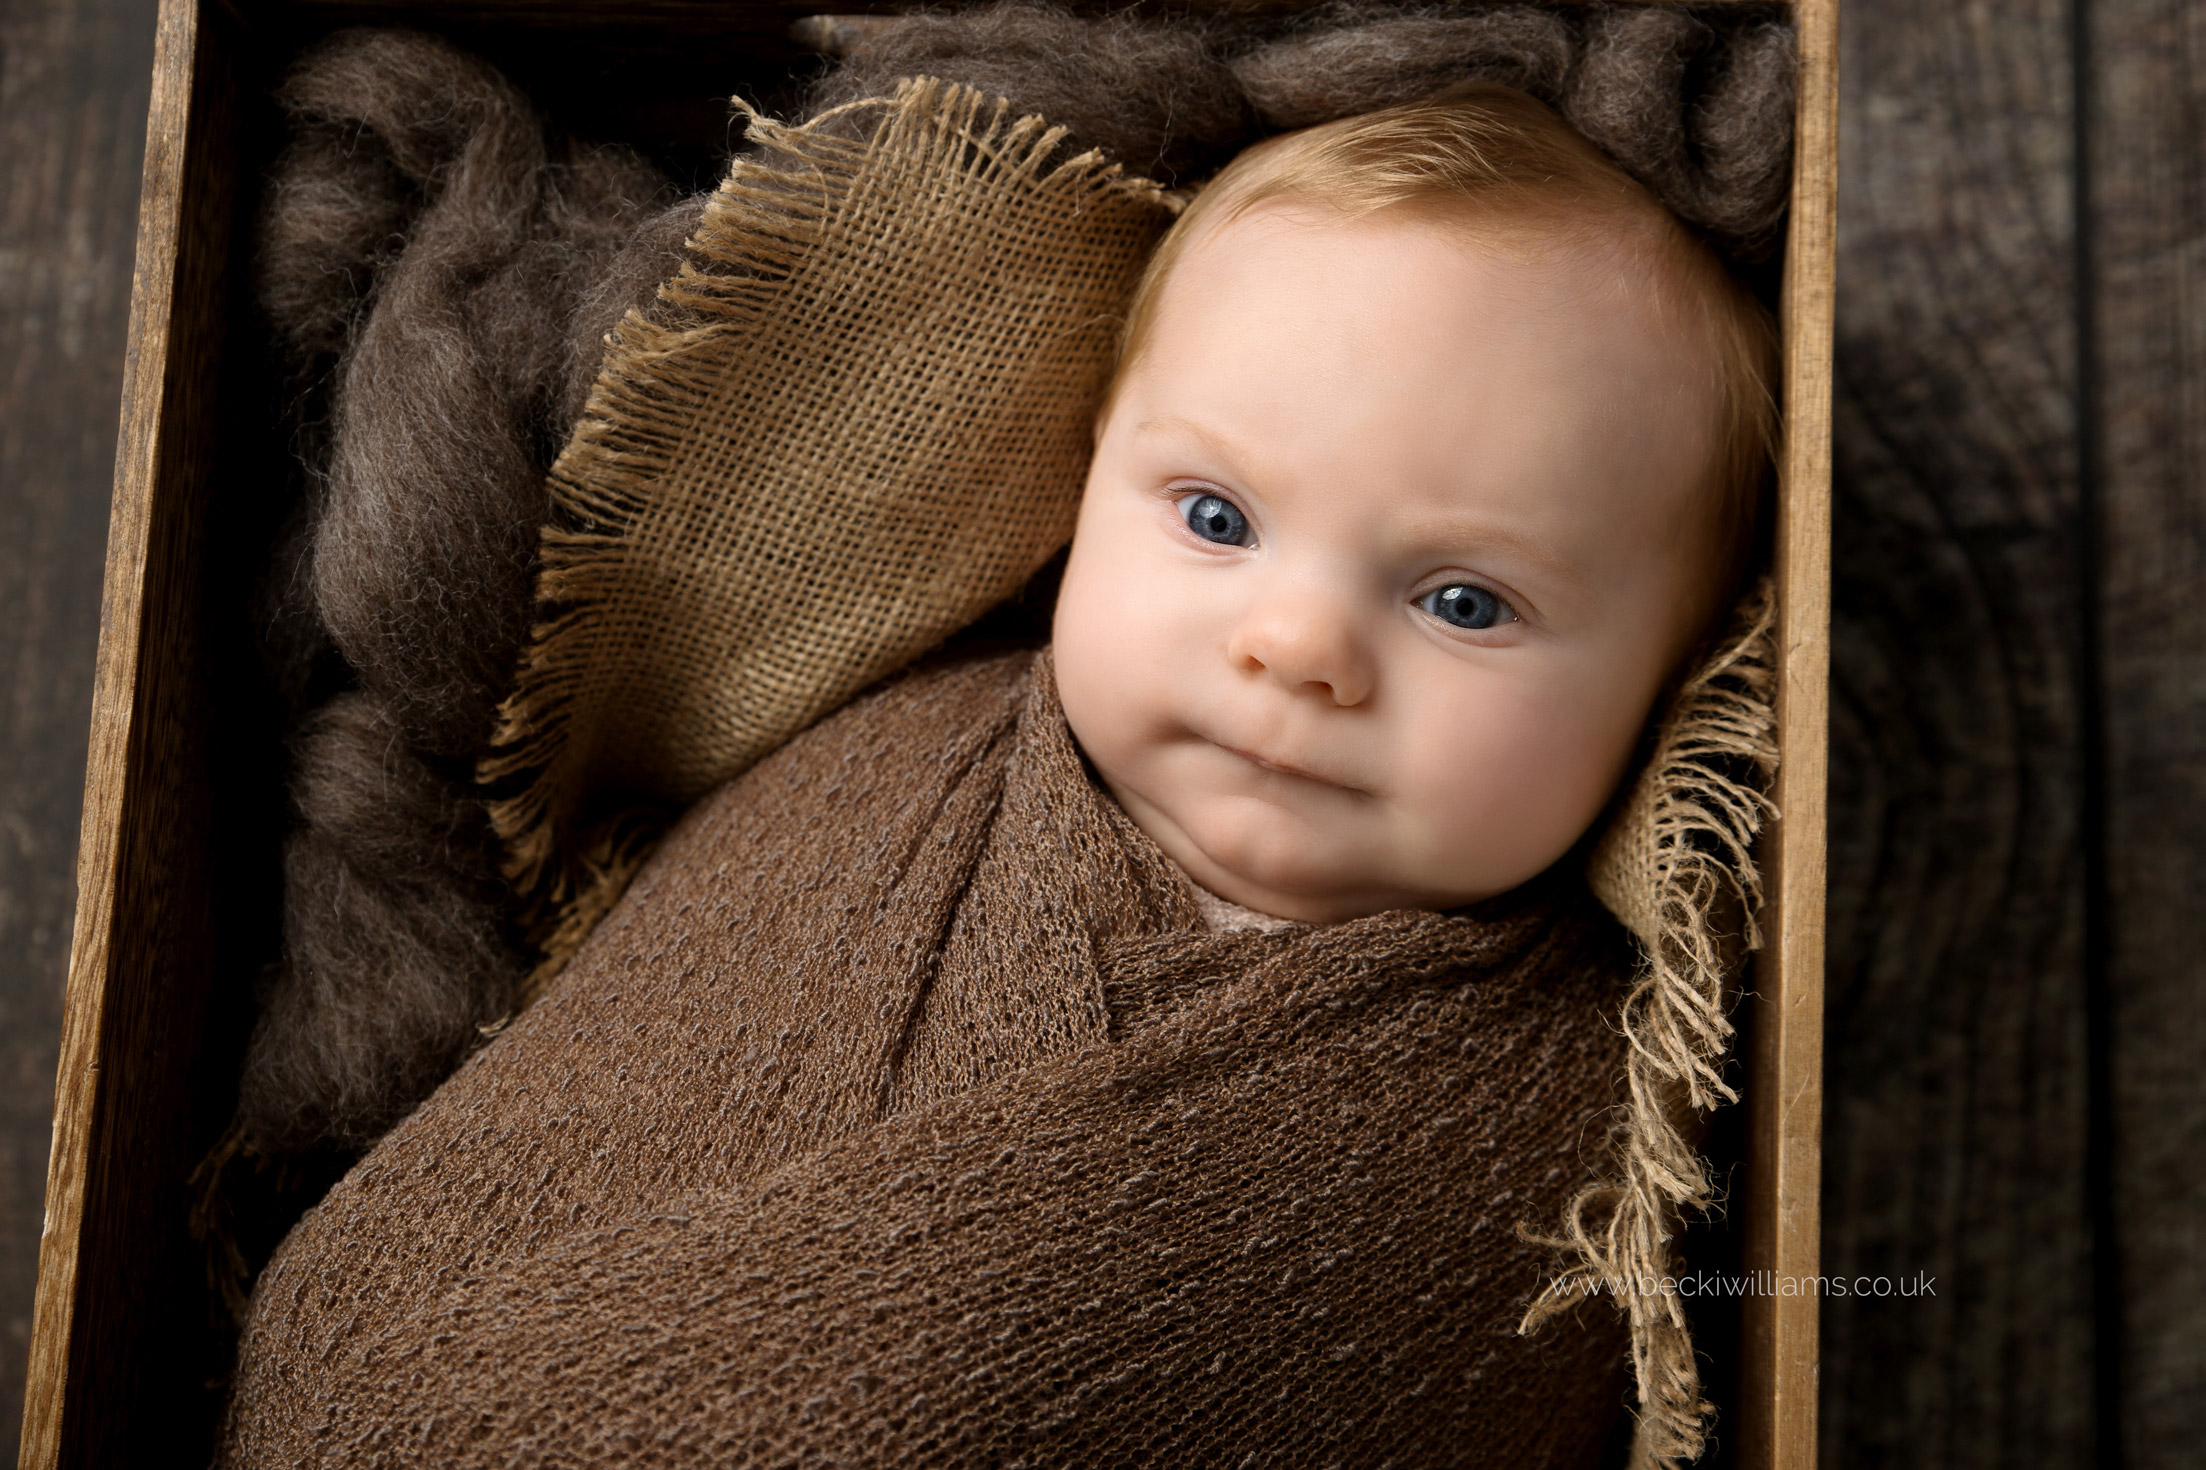 cute-baby-photos-hemel-hempstad-2-month-old-crate-awake.jpg